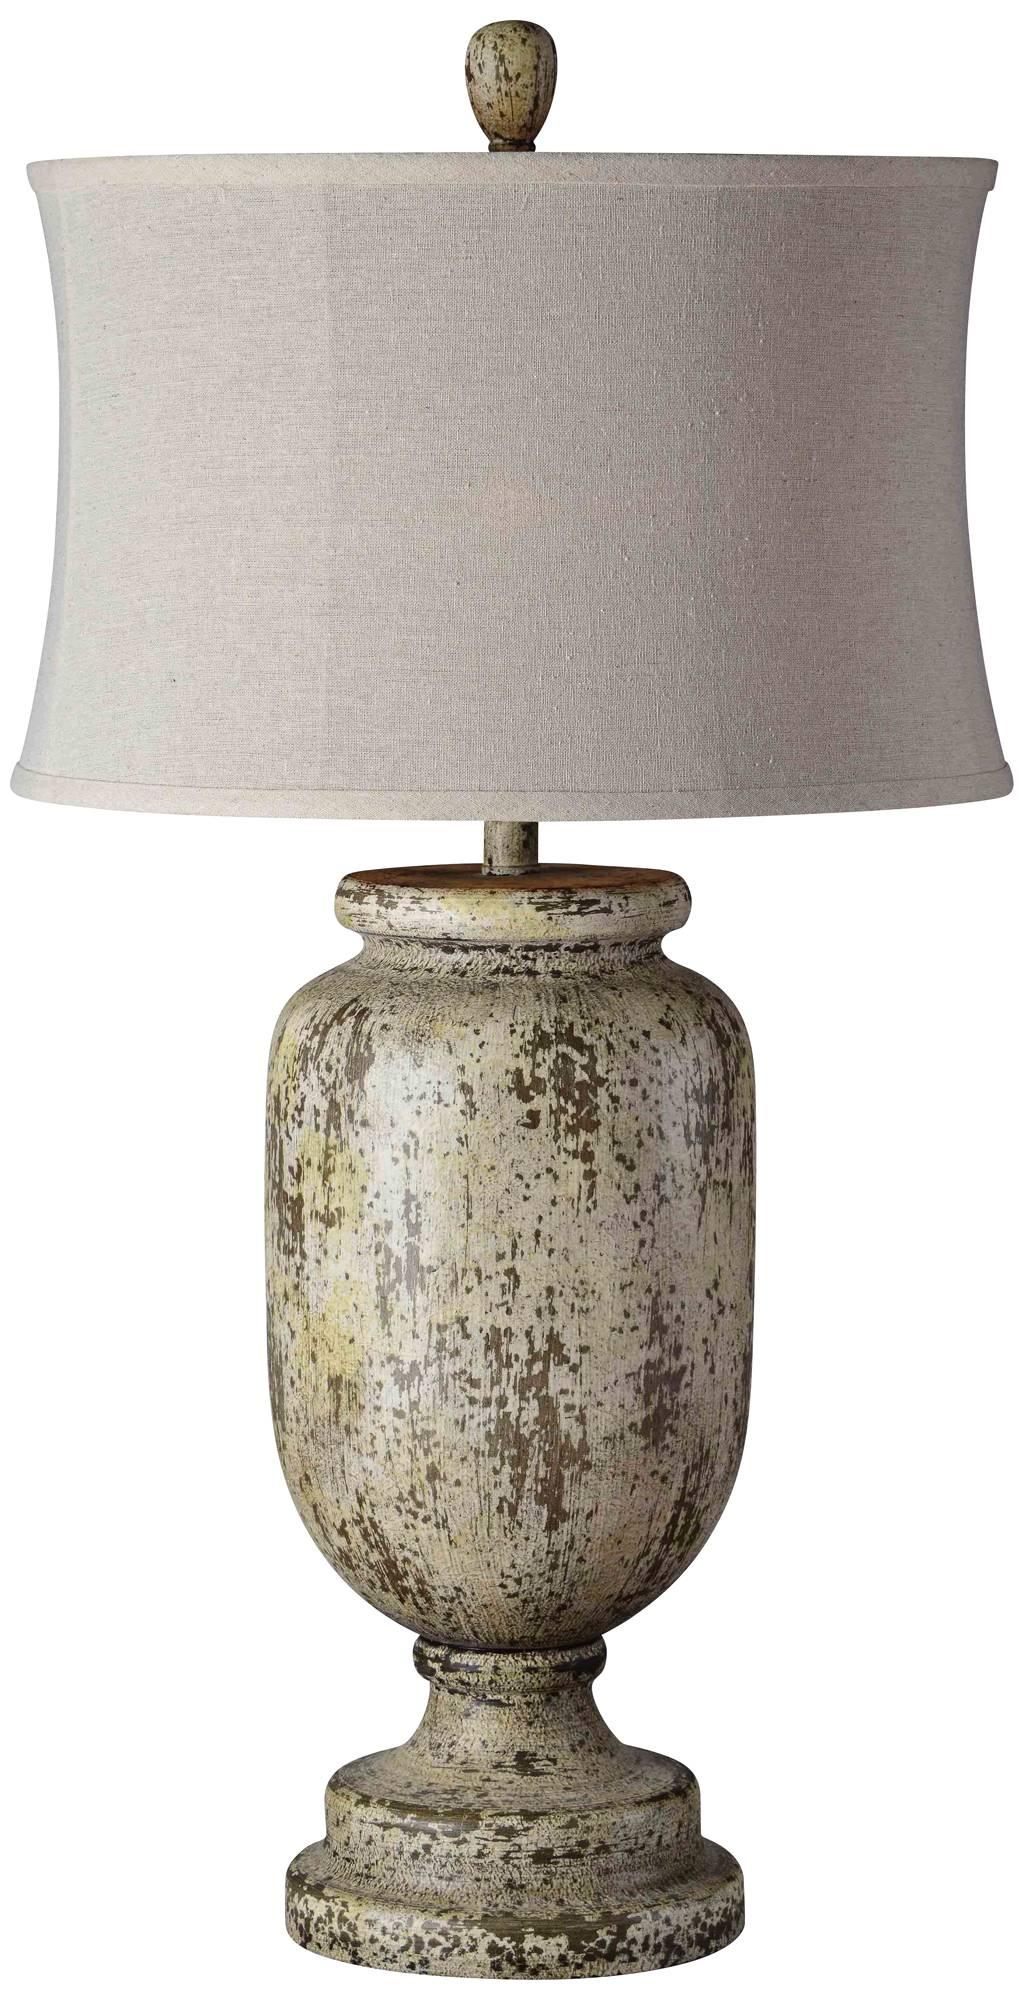 Cardiff Iron Night Light Urn Table Lamp T7663 Lamps Plus